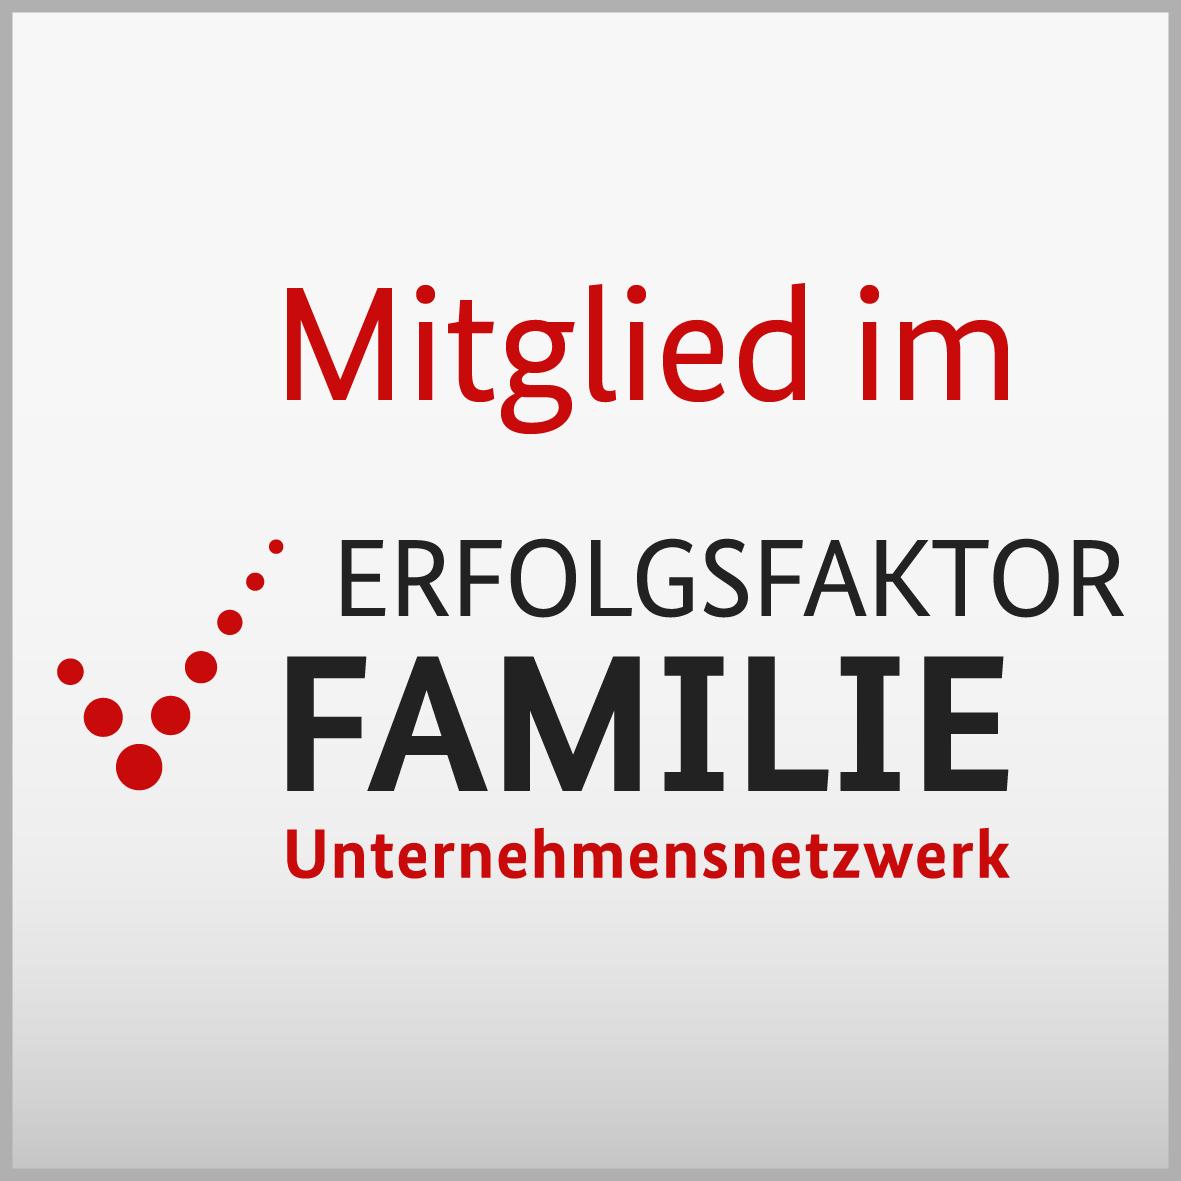 SF ist Mitglied bei Erfolgsfaktor Familie